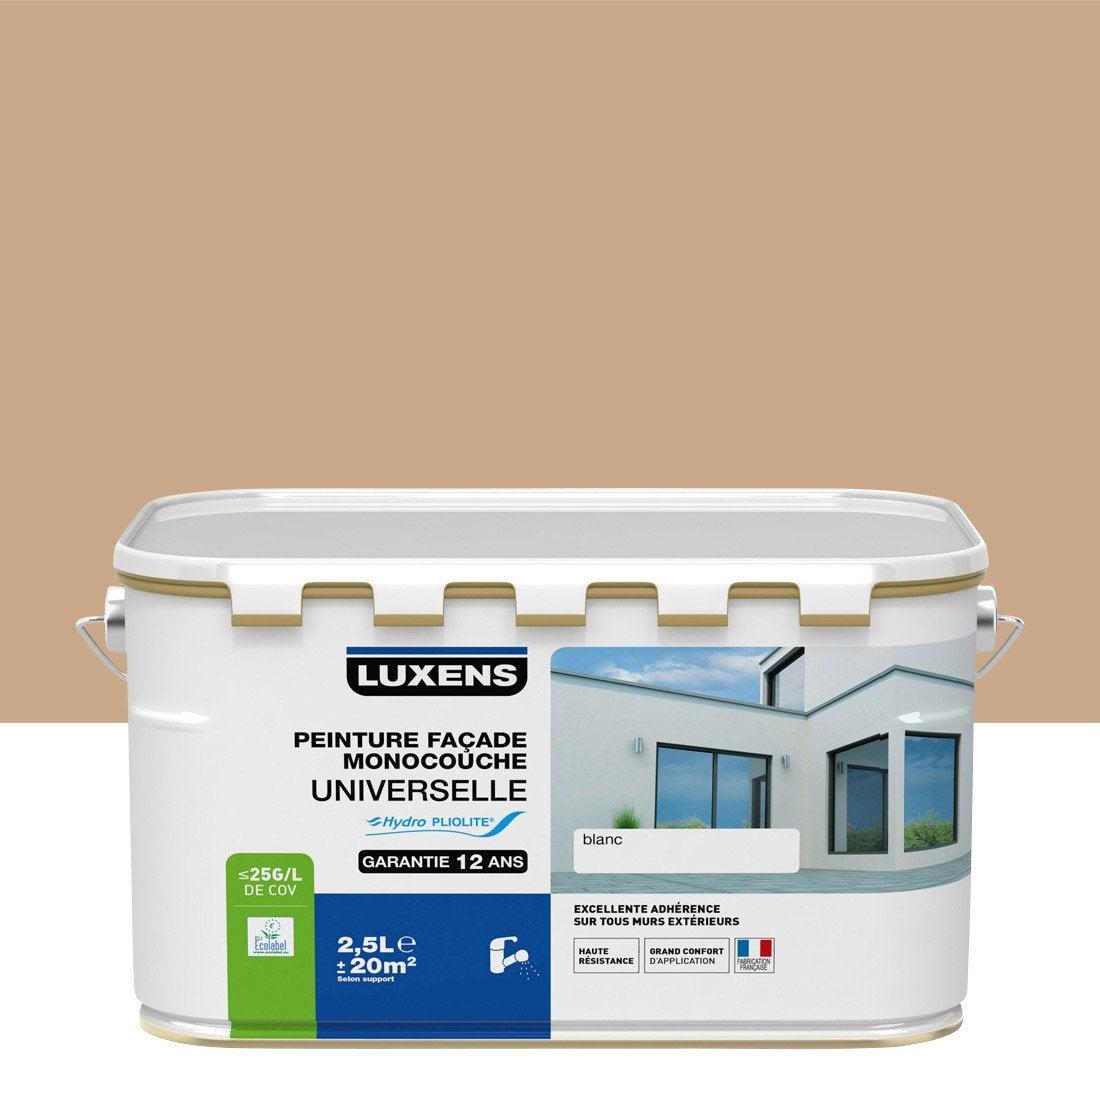 Peinture fa ade universelle luxens ocre proven al 2 5 l leroy merlin - Peinture ocre provencal ...